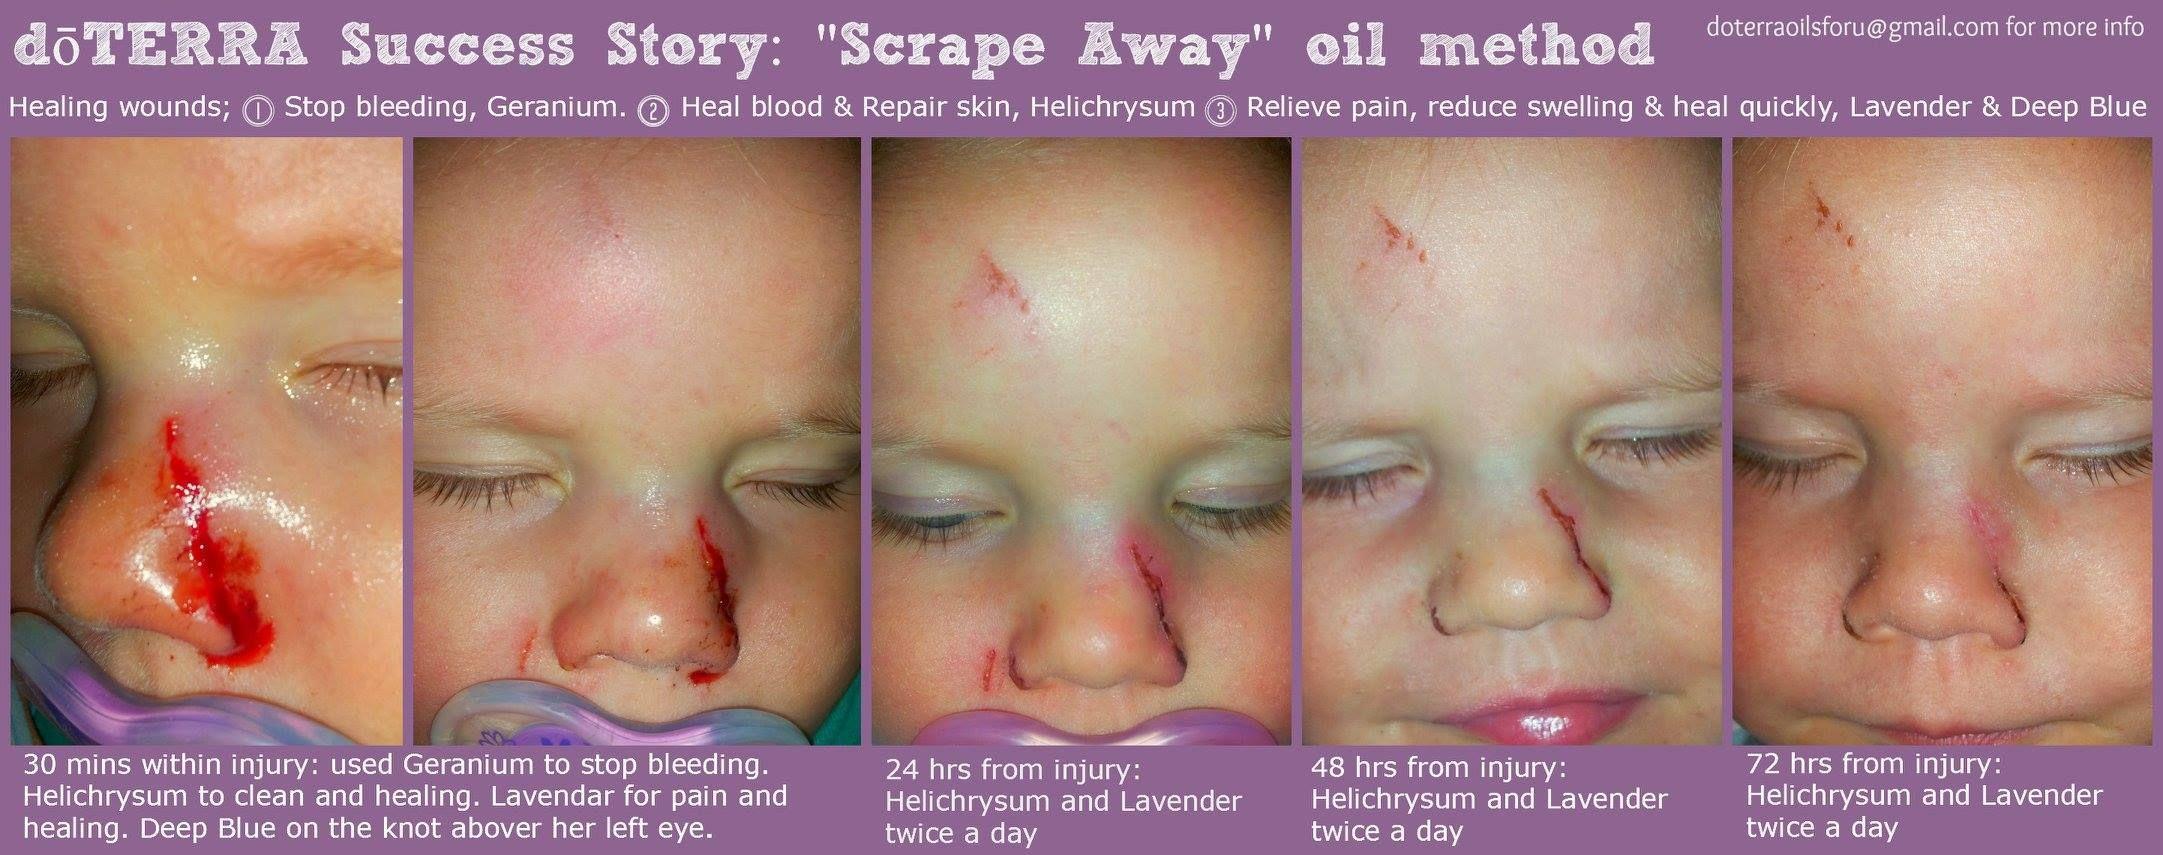 Scrape Away